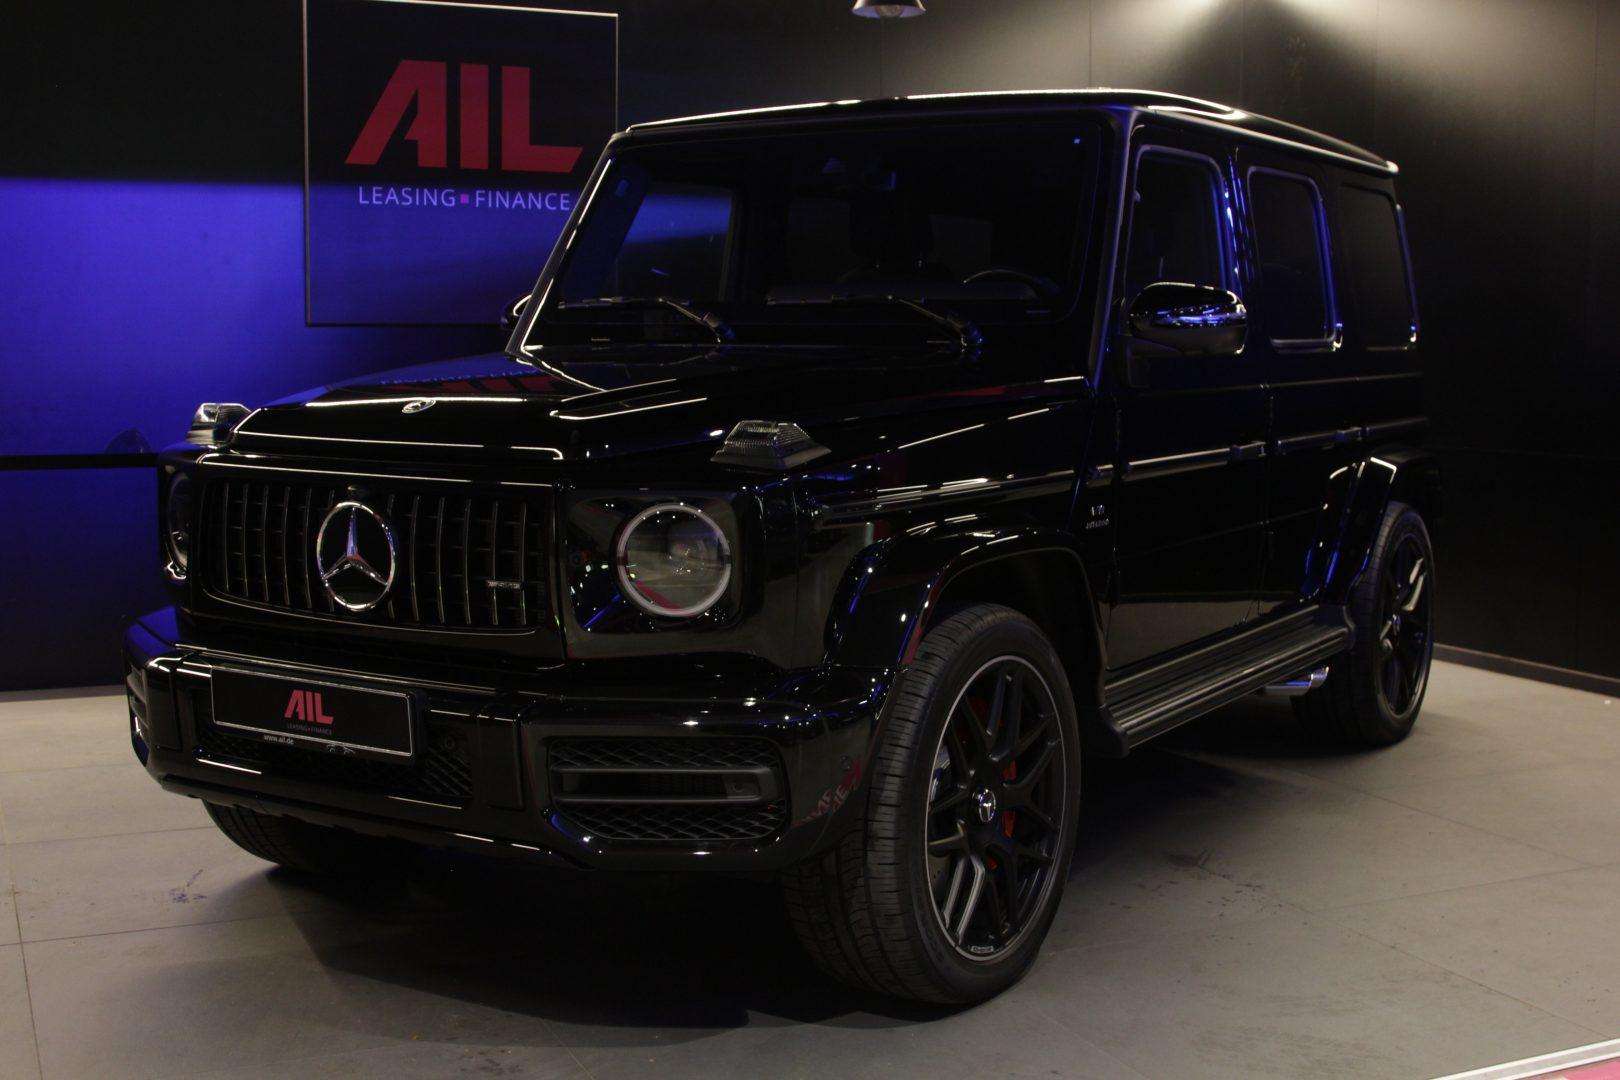 AIL Mercedes-Benz G 63 AMG Carbon Paket Burmester 7